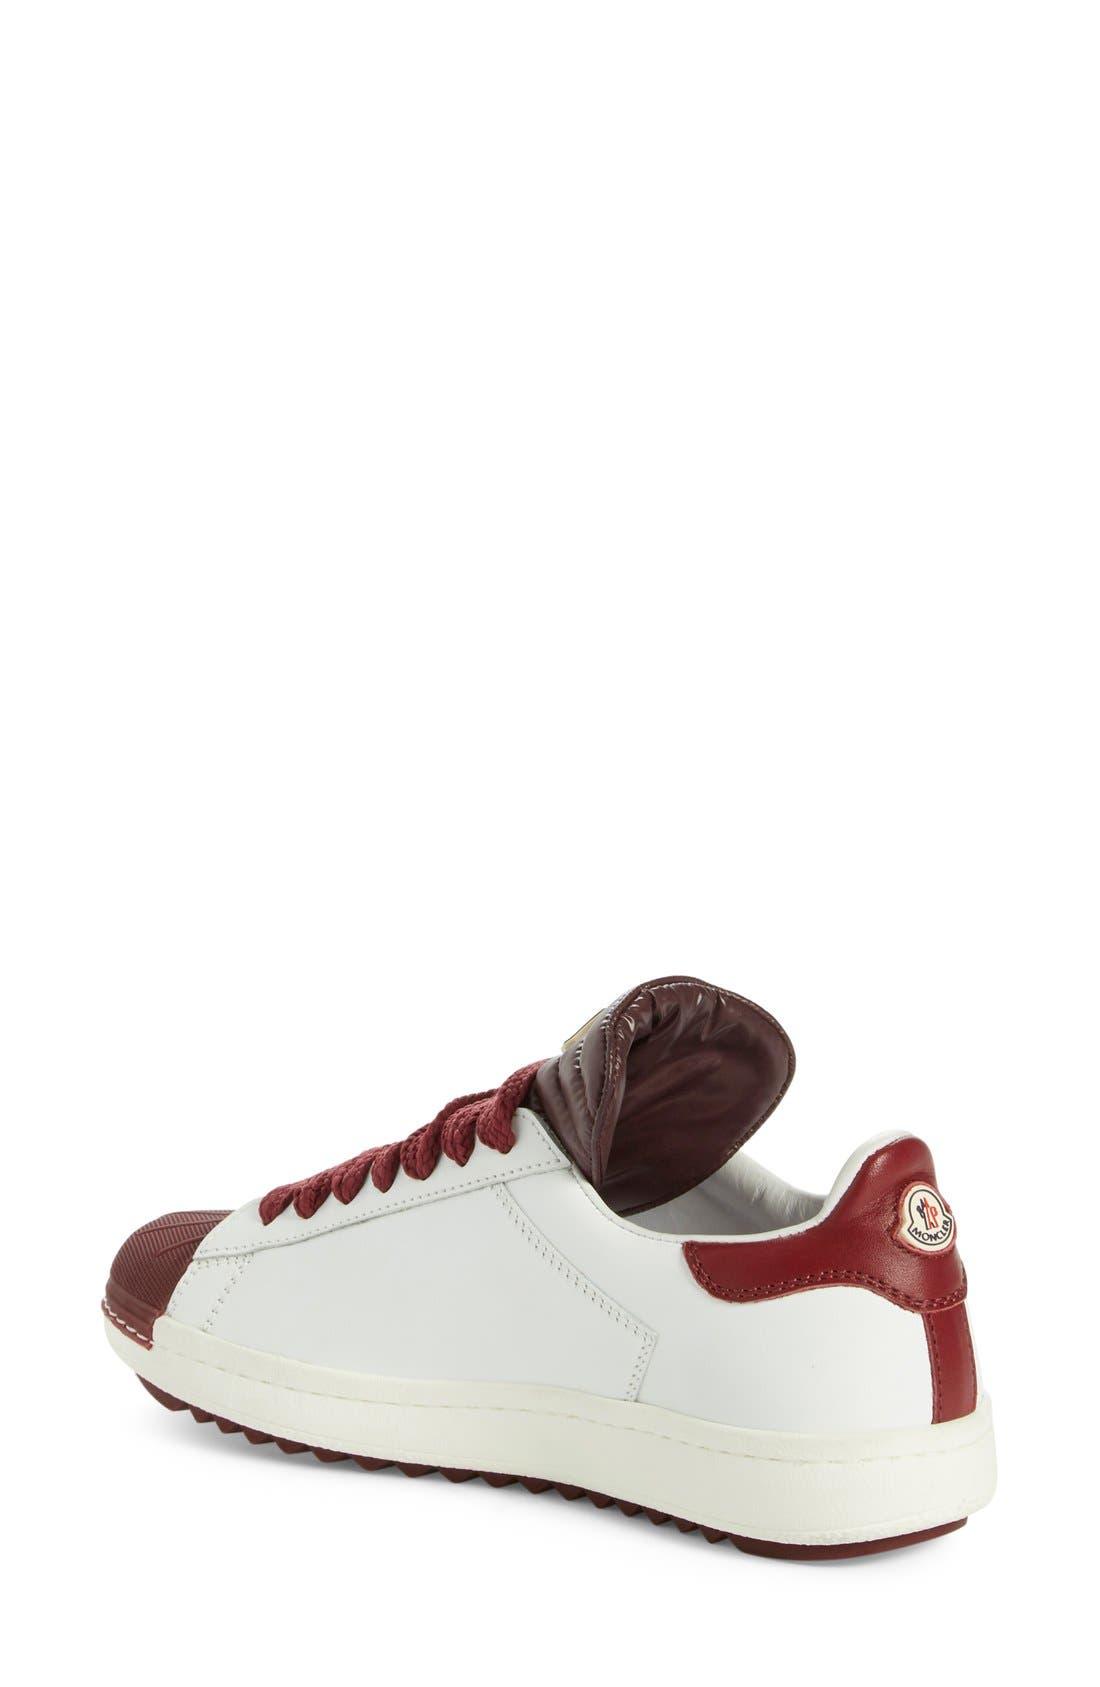 'Angeline Scarpa' Sneaker,                             Alternate thumbnail 4, color,